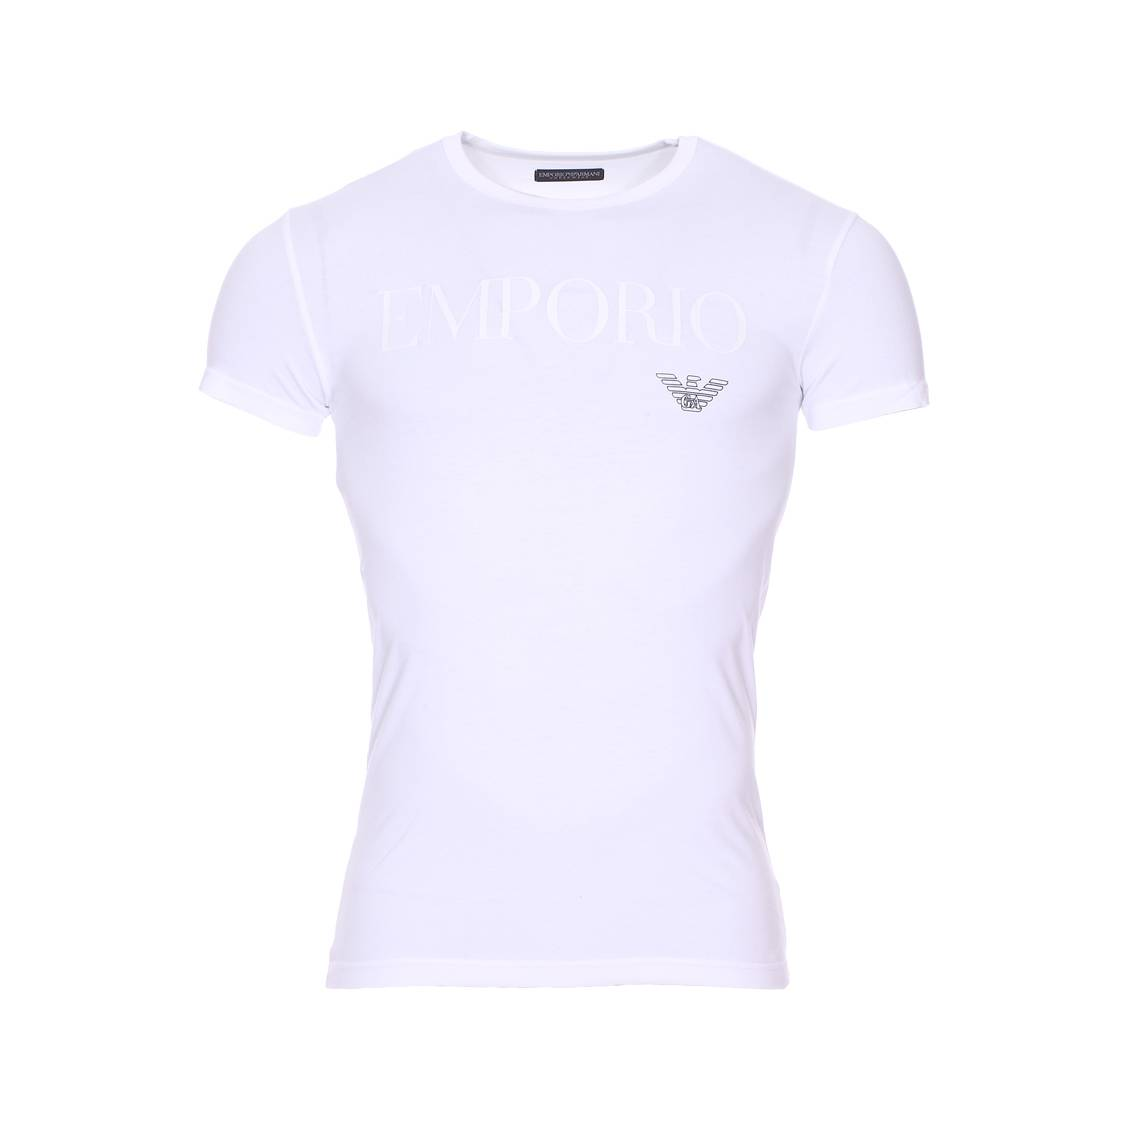 Tee-shirt col rond  en coton stretch blanc floqué